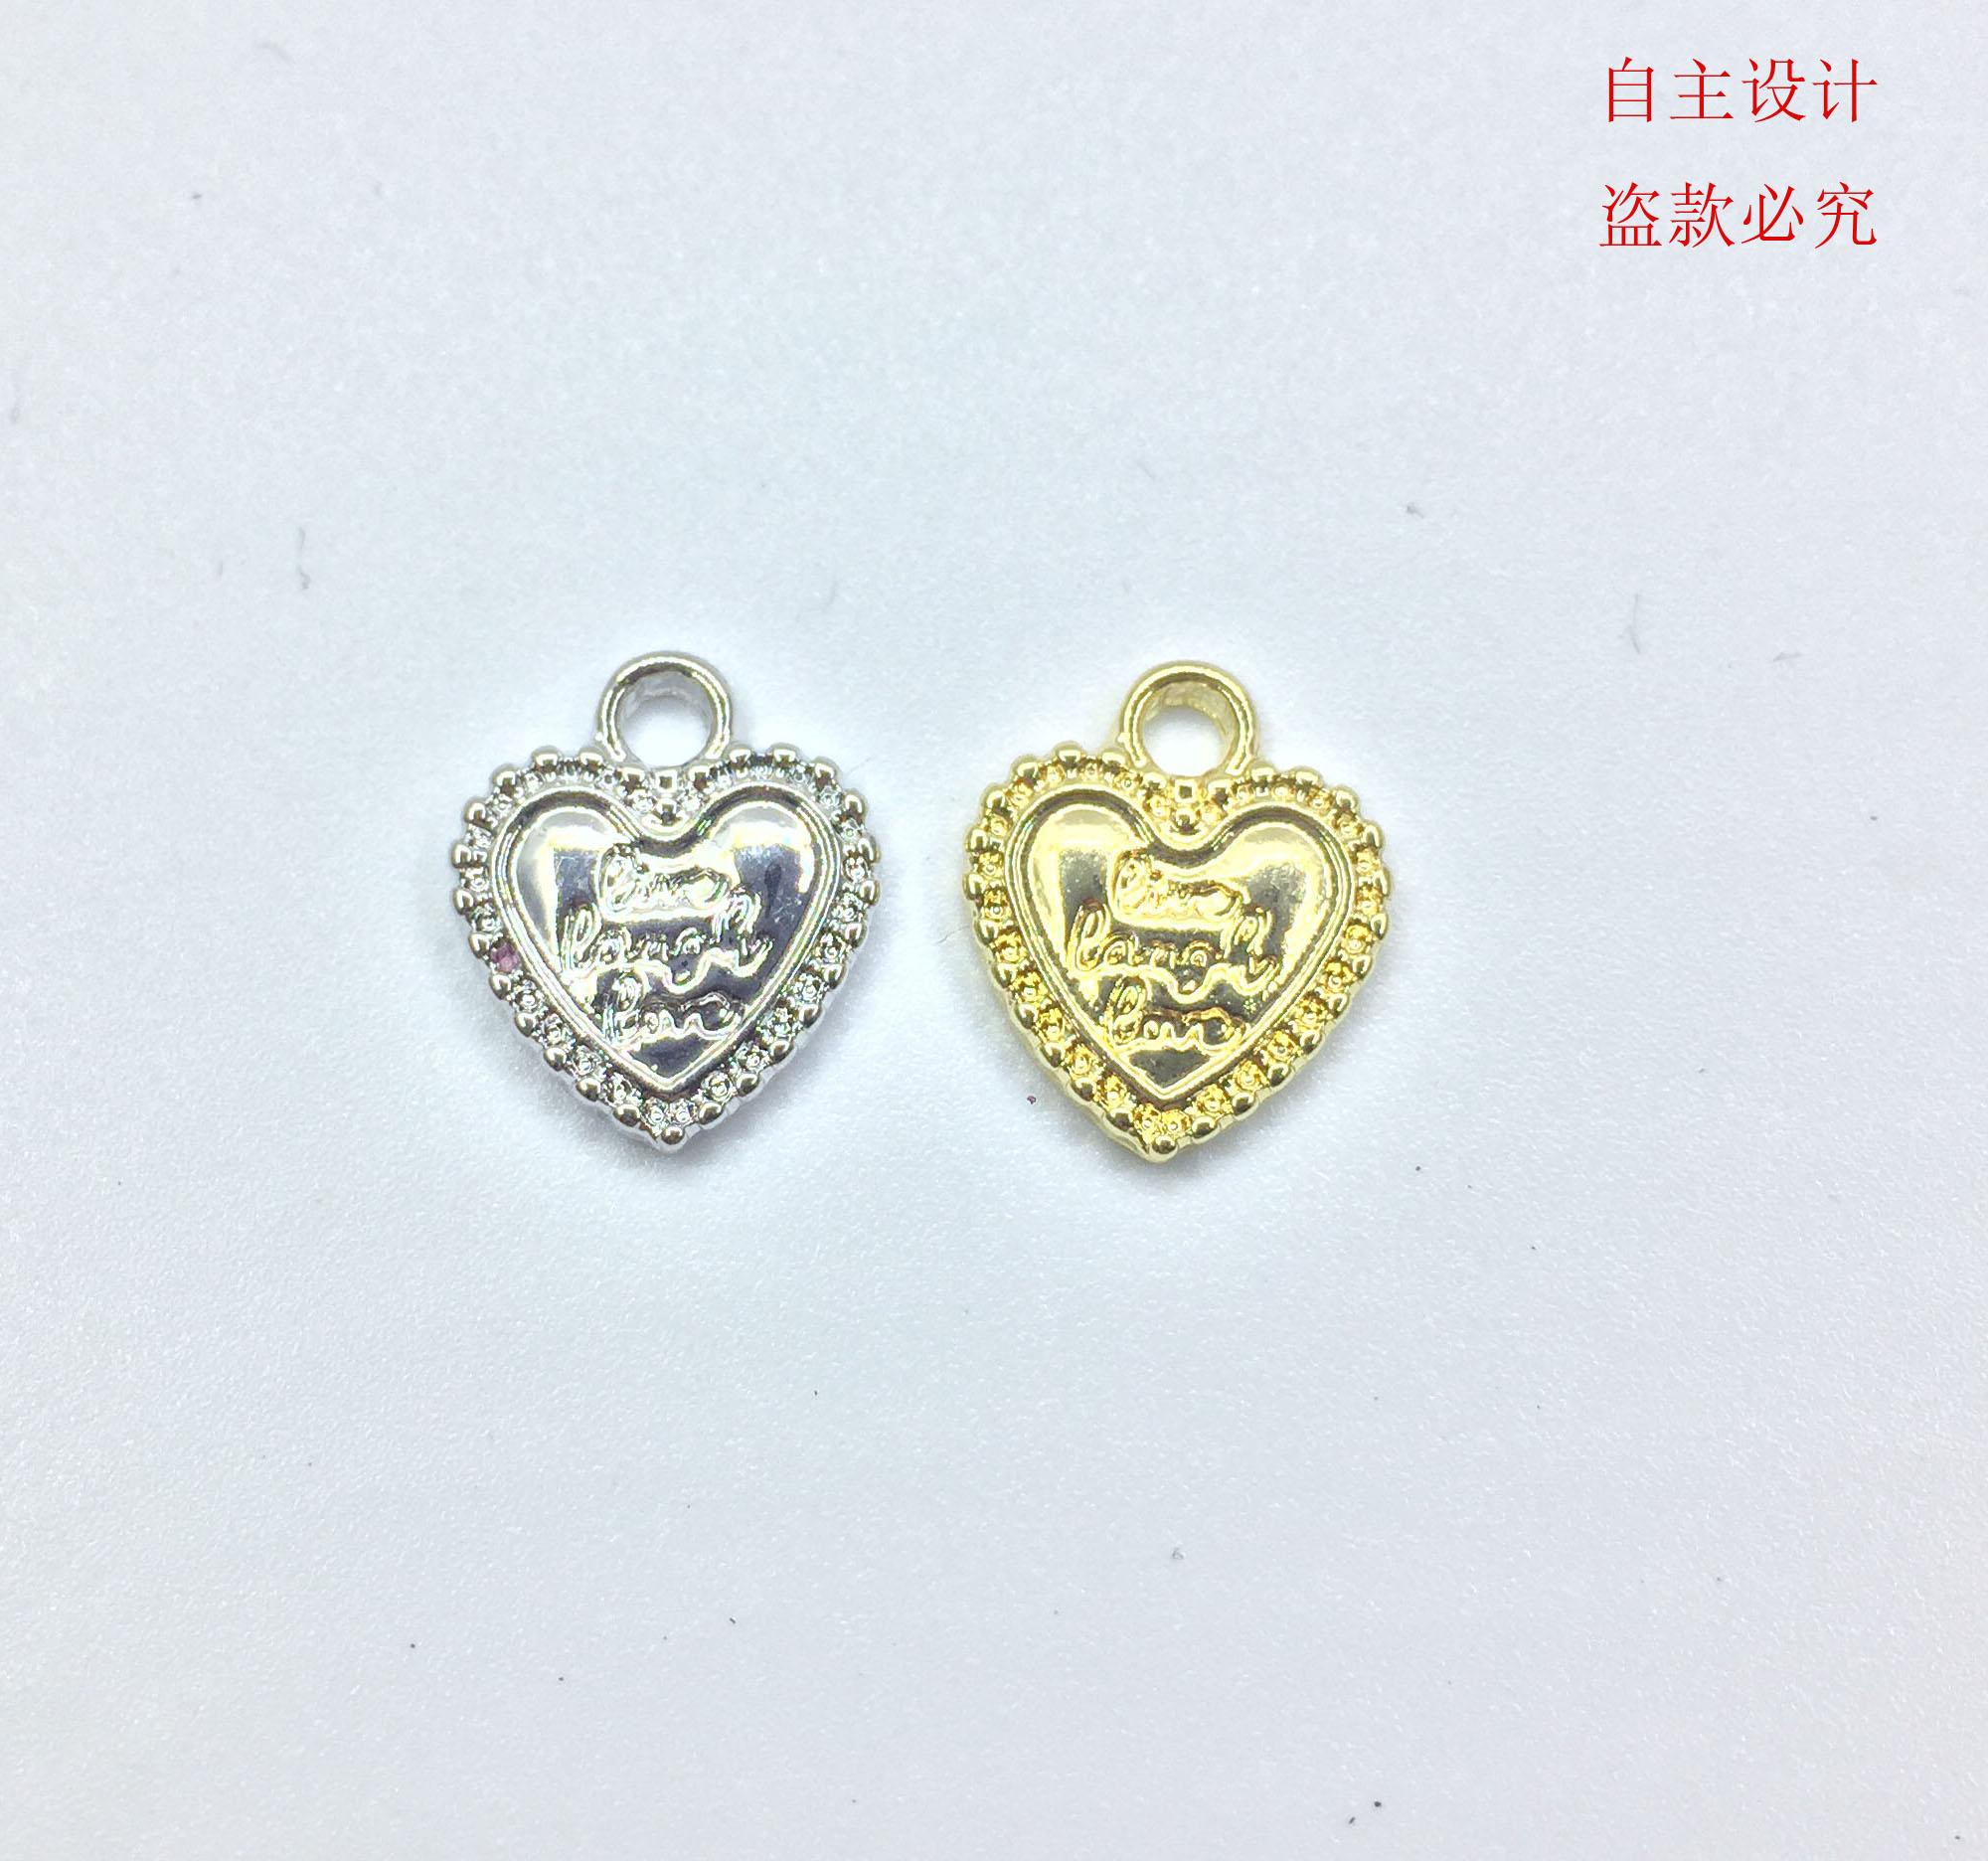 10pcs Seashell Charms silver tone 2 sided Seashell Charms pendants 13x15mm